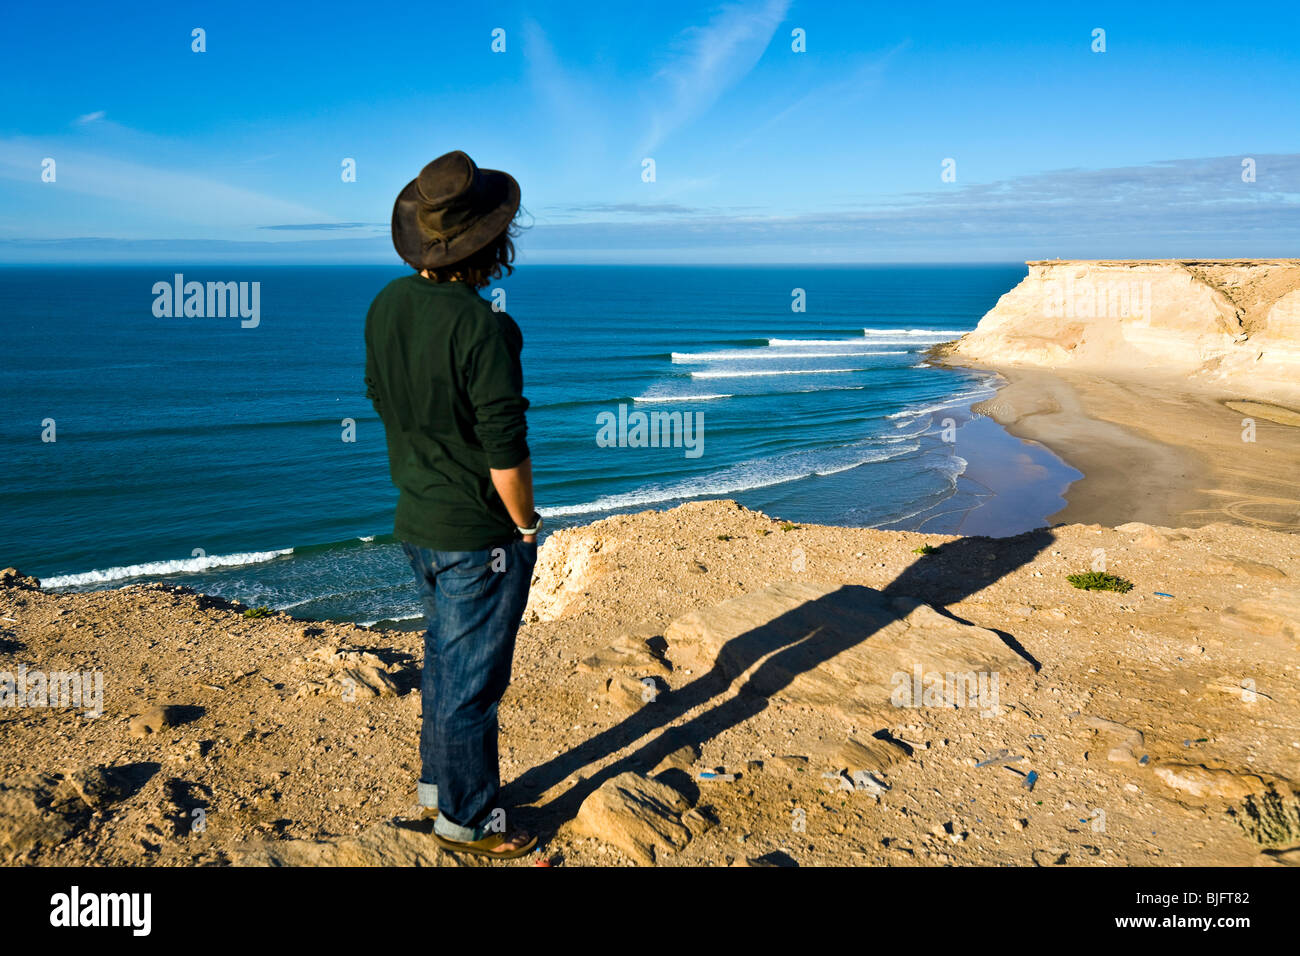 Western Sahara, waves, Atlantic Ocean. Erwan Simon (FRA). - Stock Image